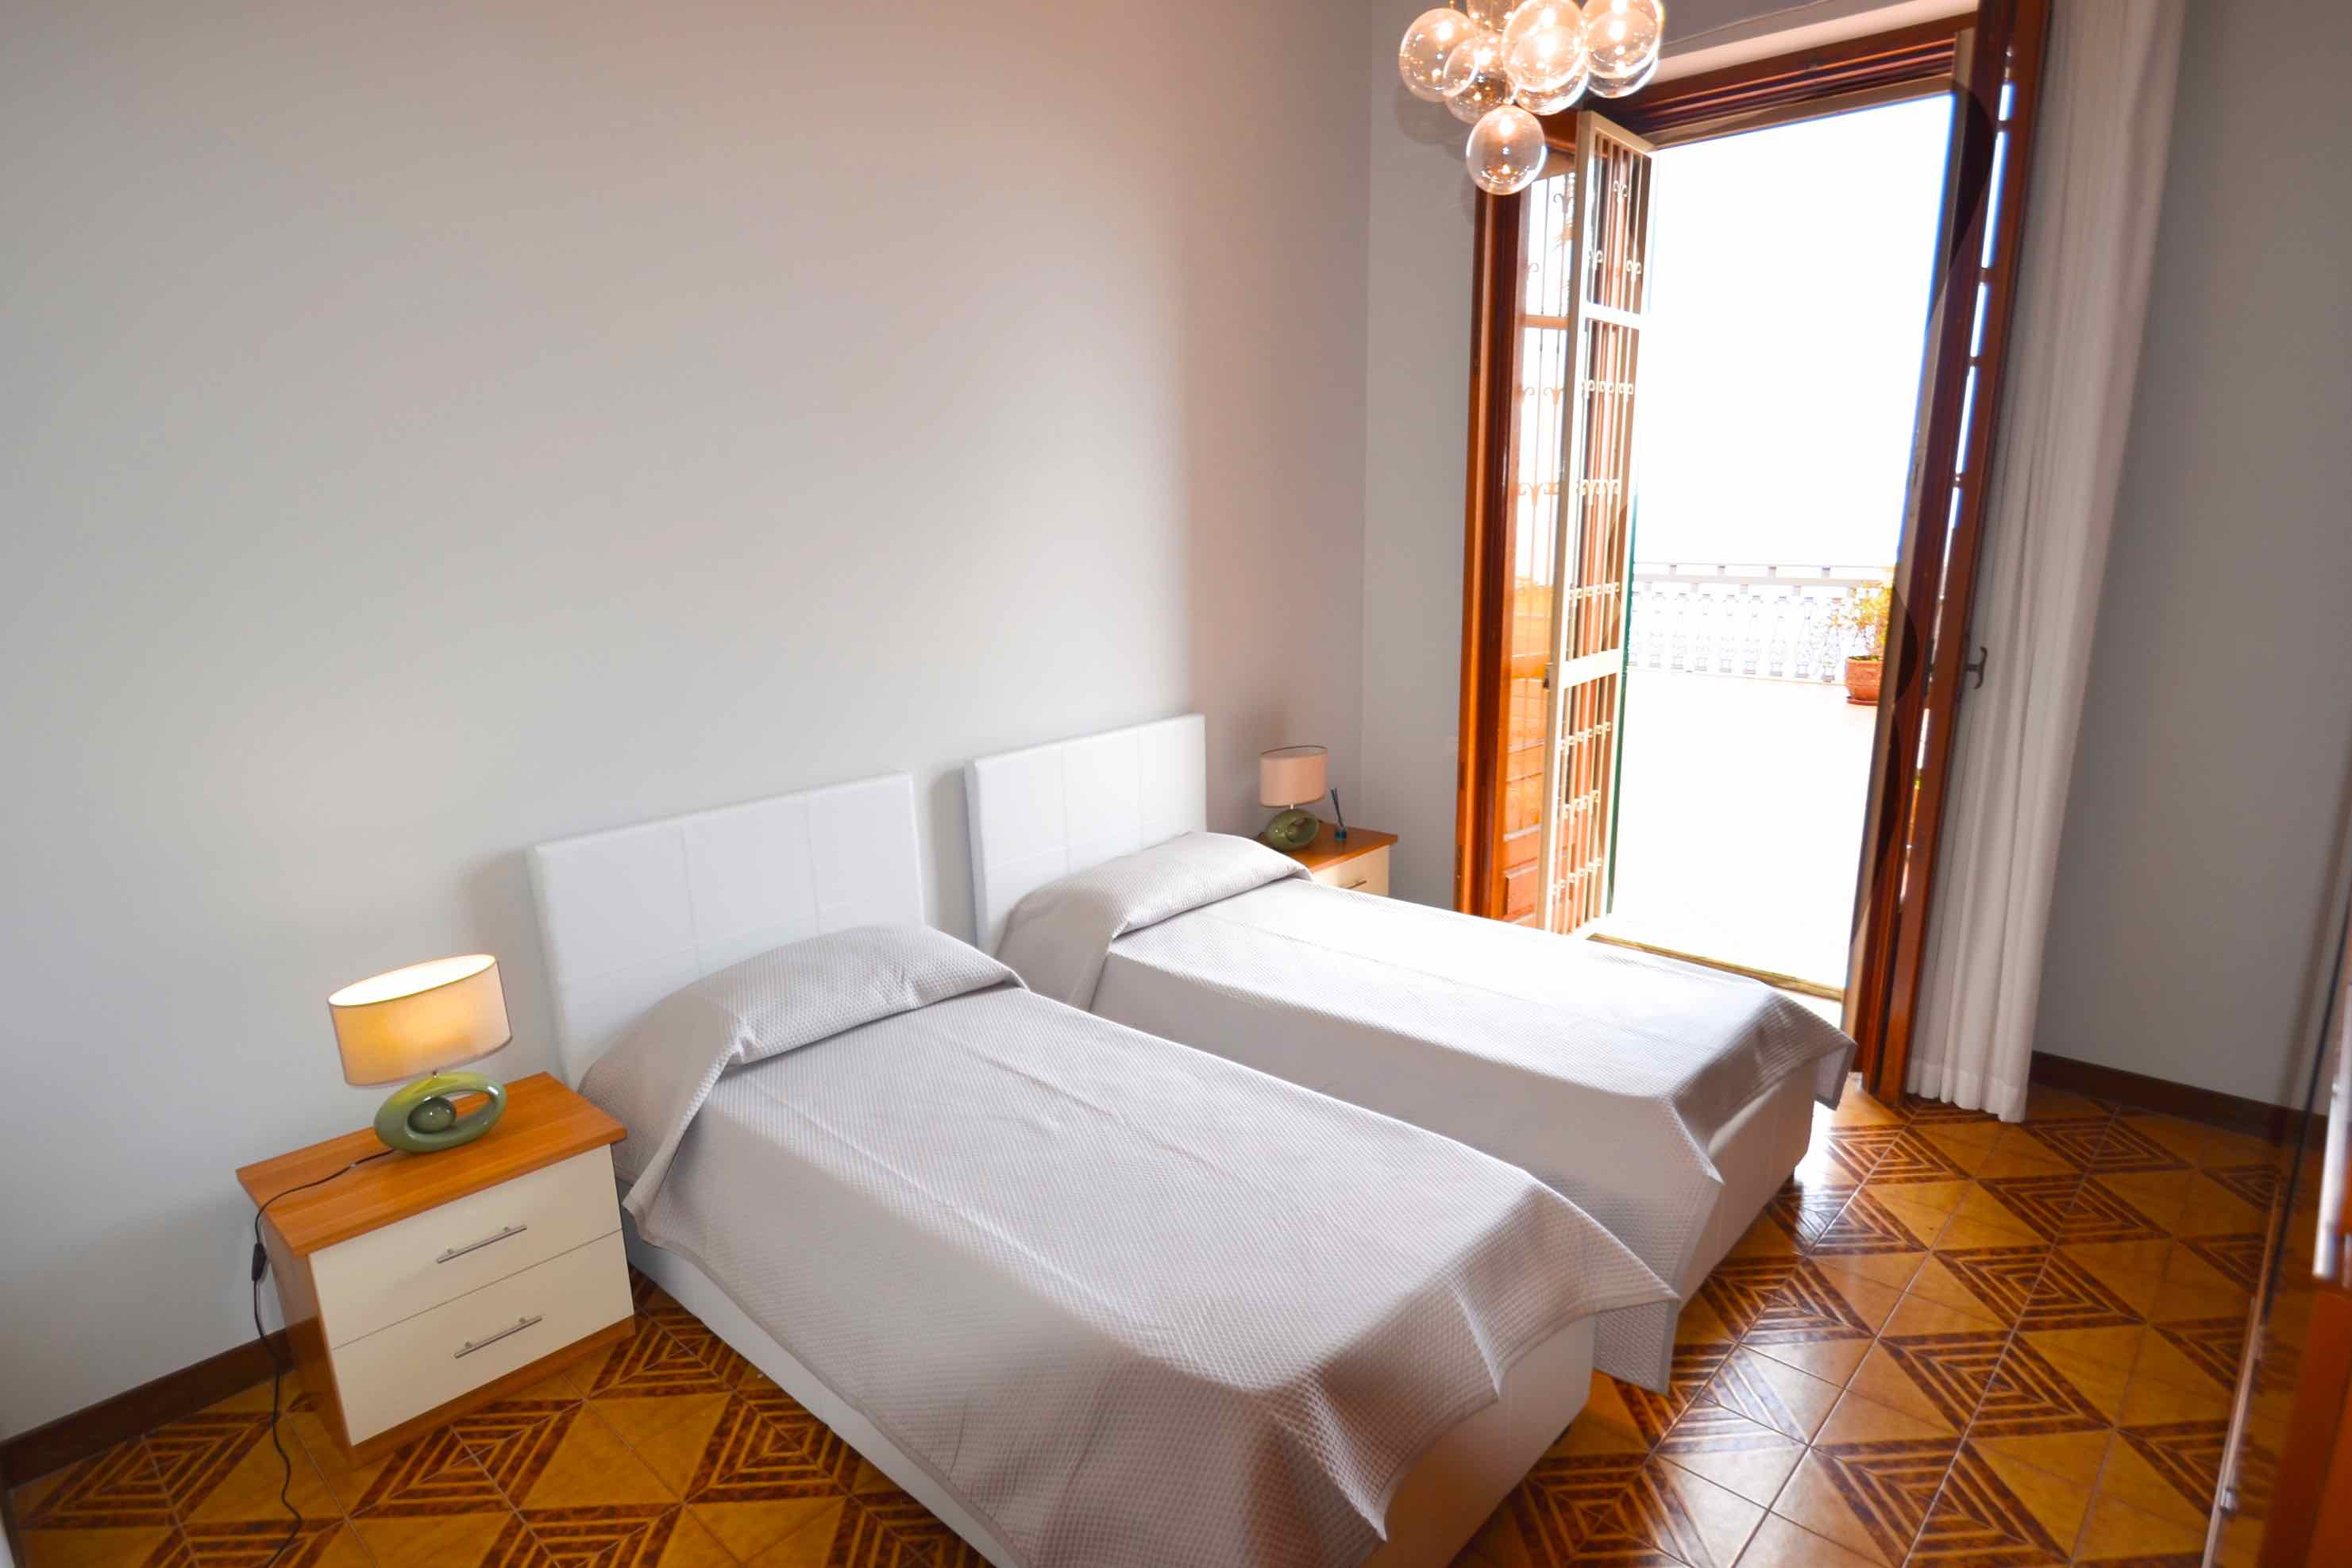 Ferienhaus Villa La Timpa - ancient and majestic villawhich enjoys a wonderful view of Mount Etna an (2037230), Acireale, Catania, Sizilien, Italien, Bild 13